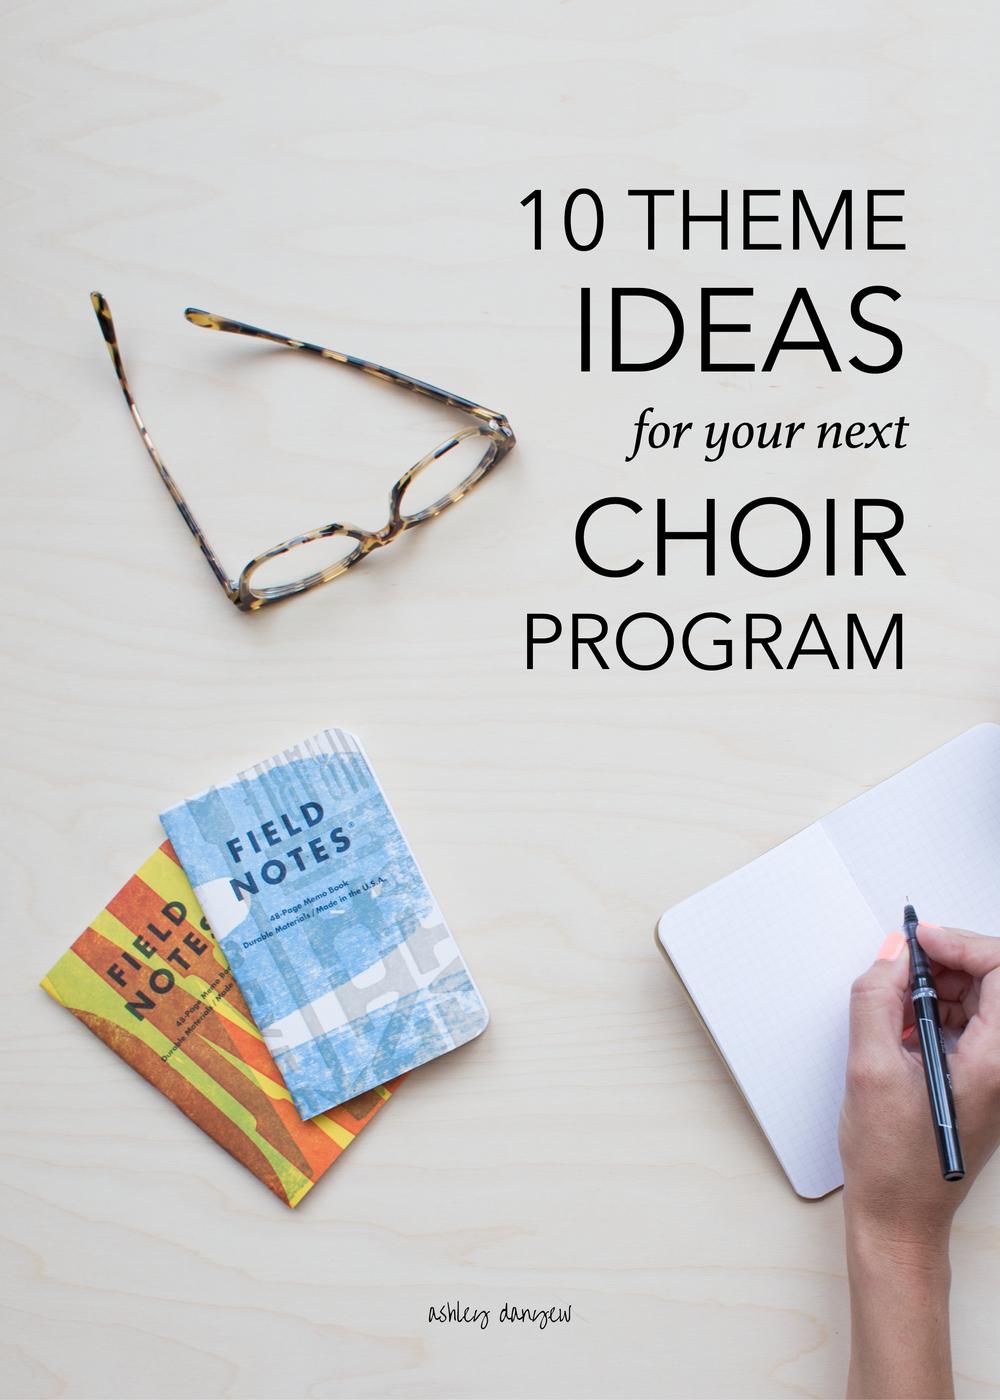 Copy of 10 Theme Ideas for Your Next Choir Program